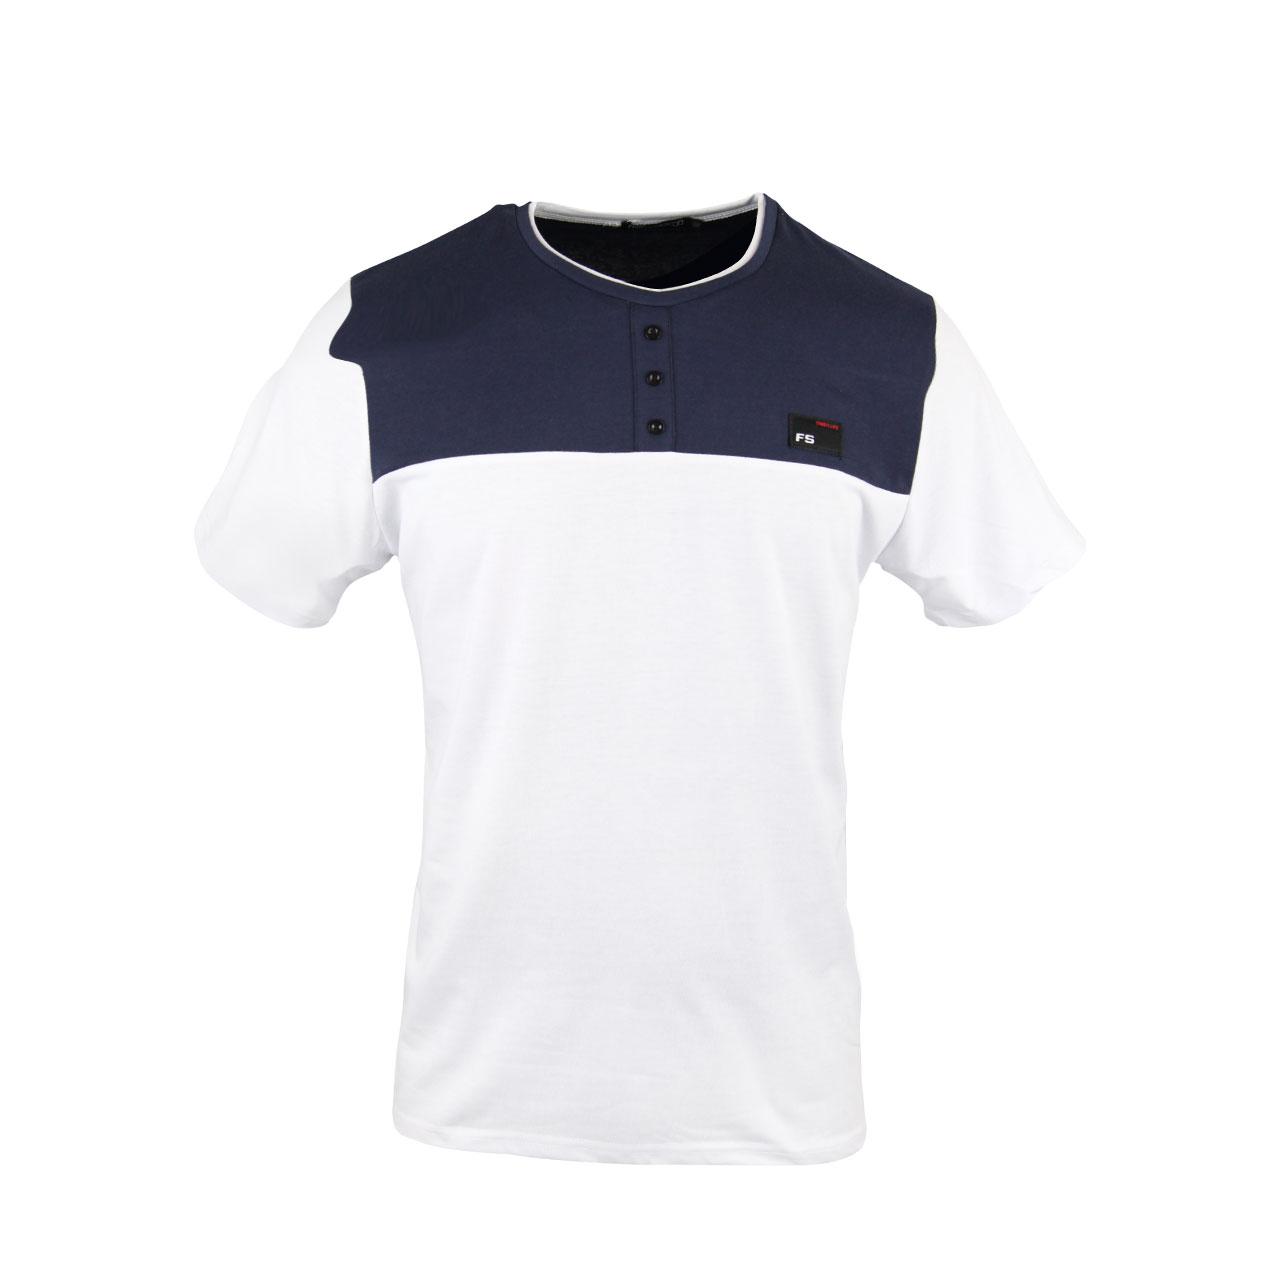 Men's Royal Blue White Collared Henley T Shirt